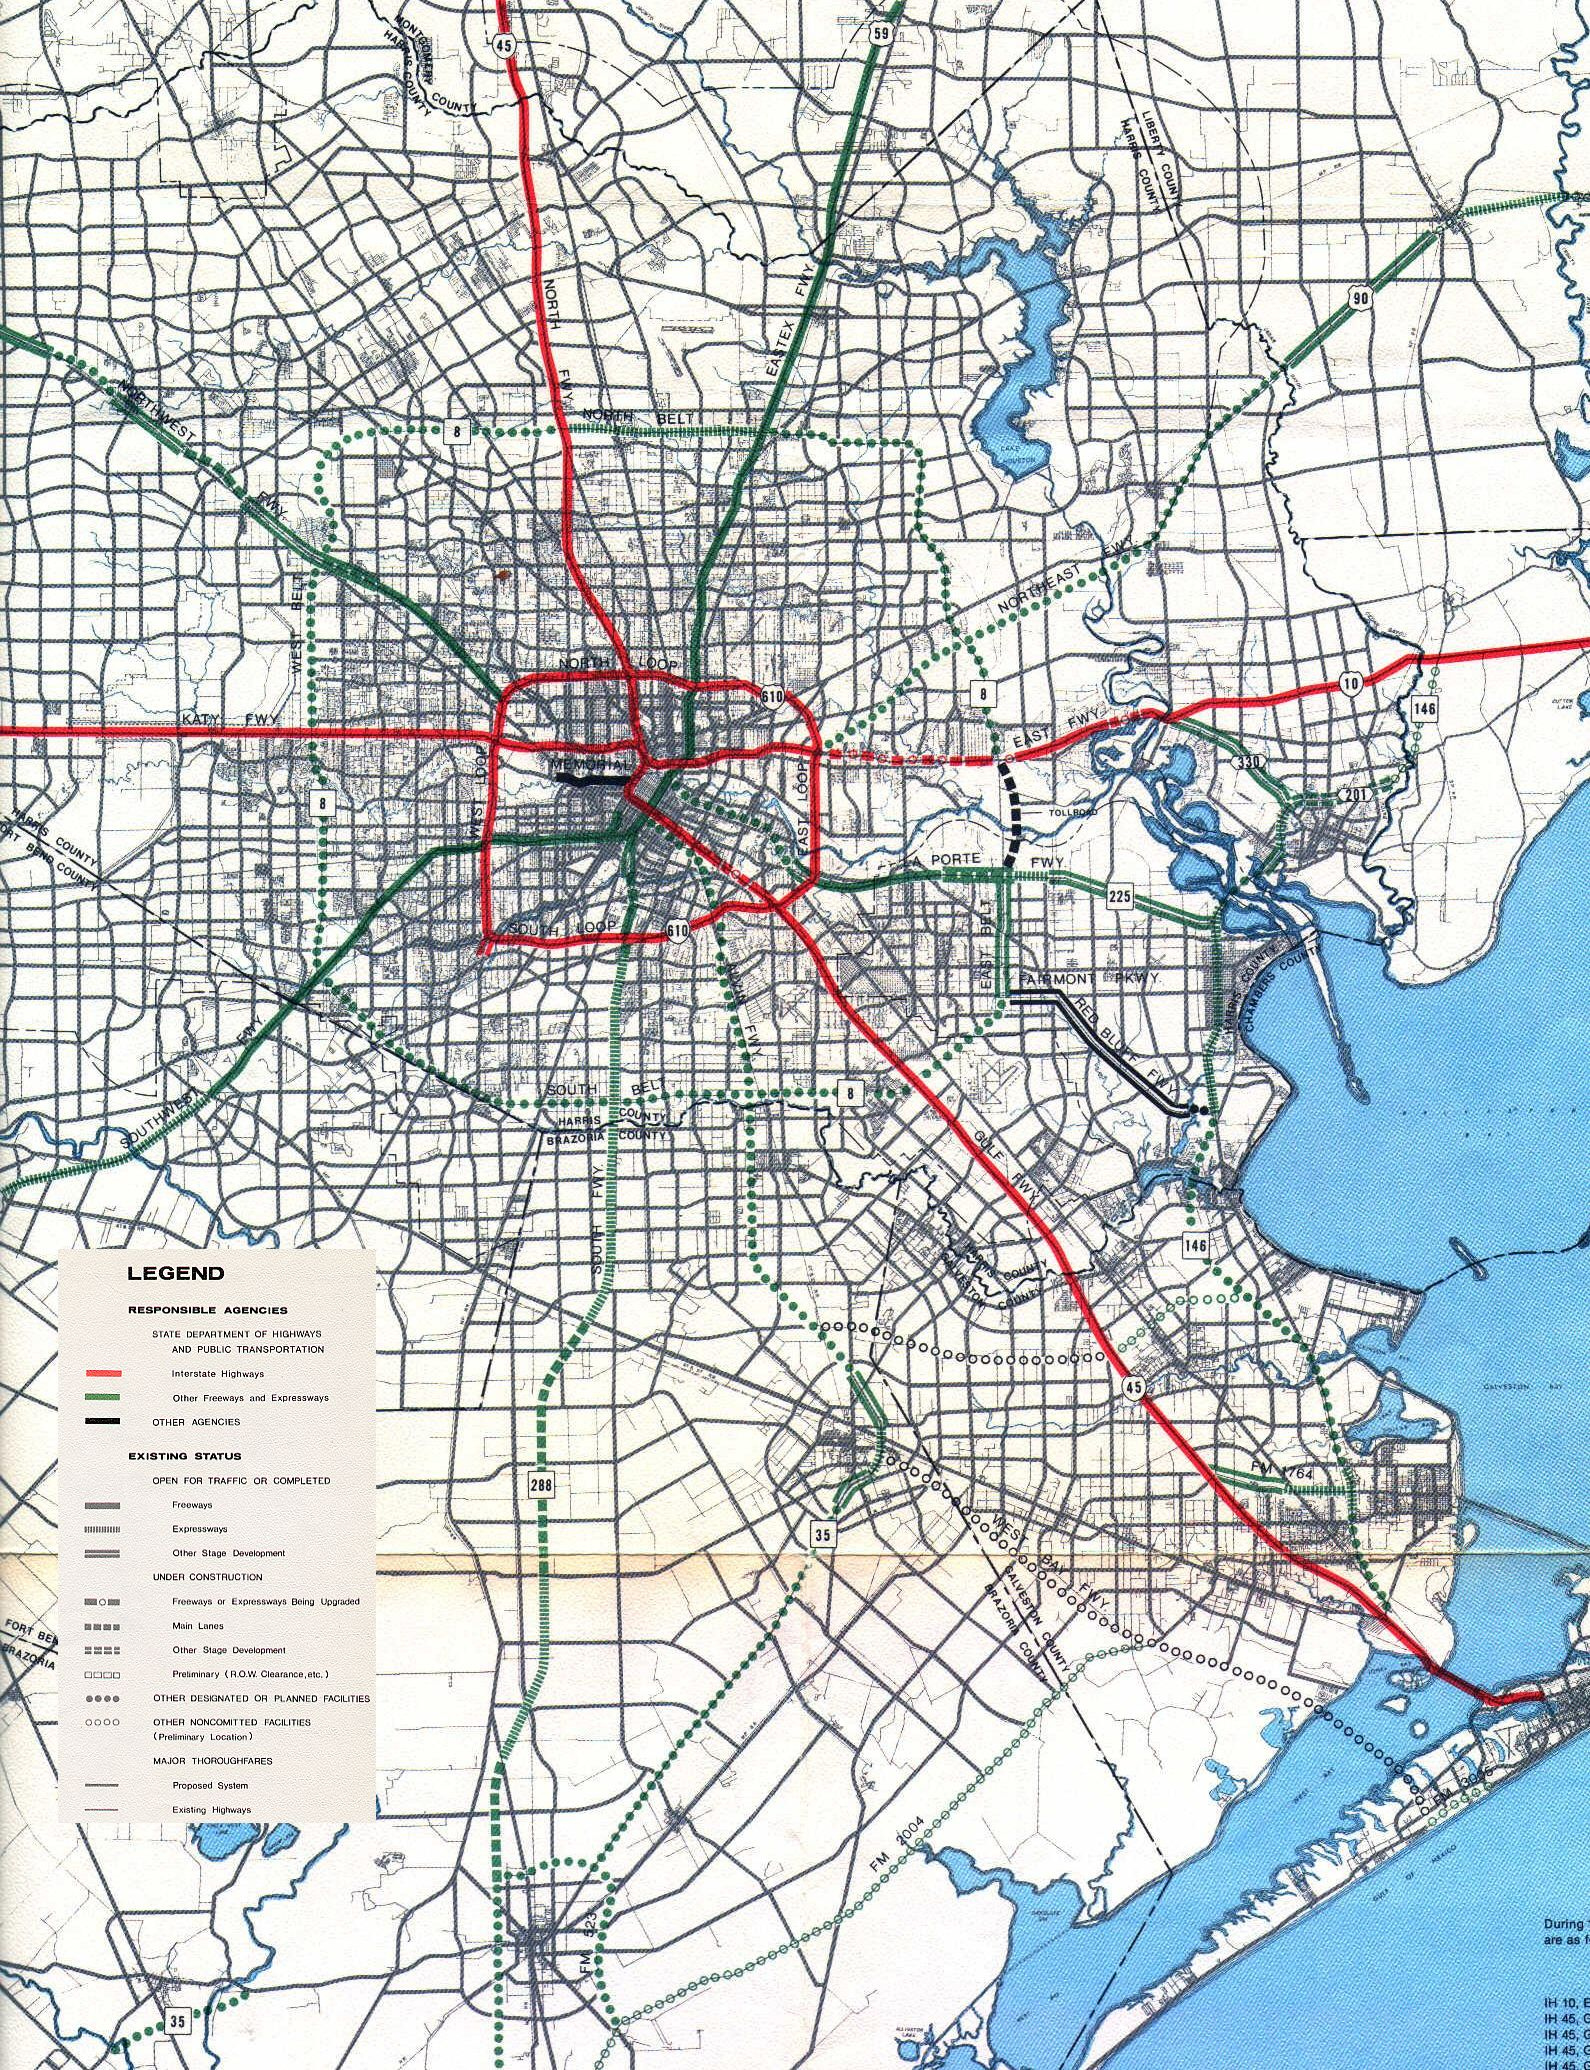 TexasFreewaycom Houston Freeway Planning Maps